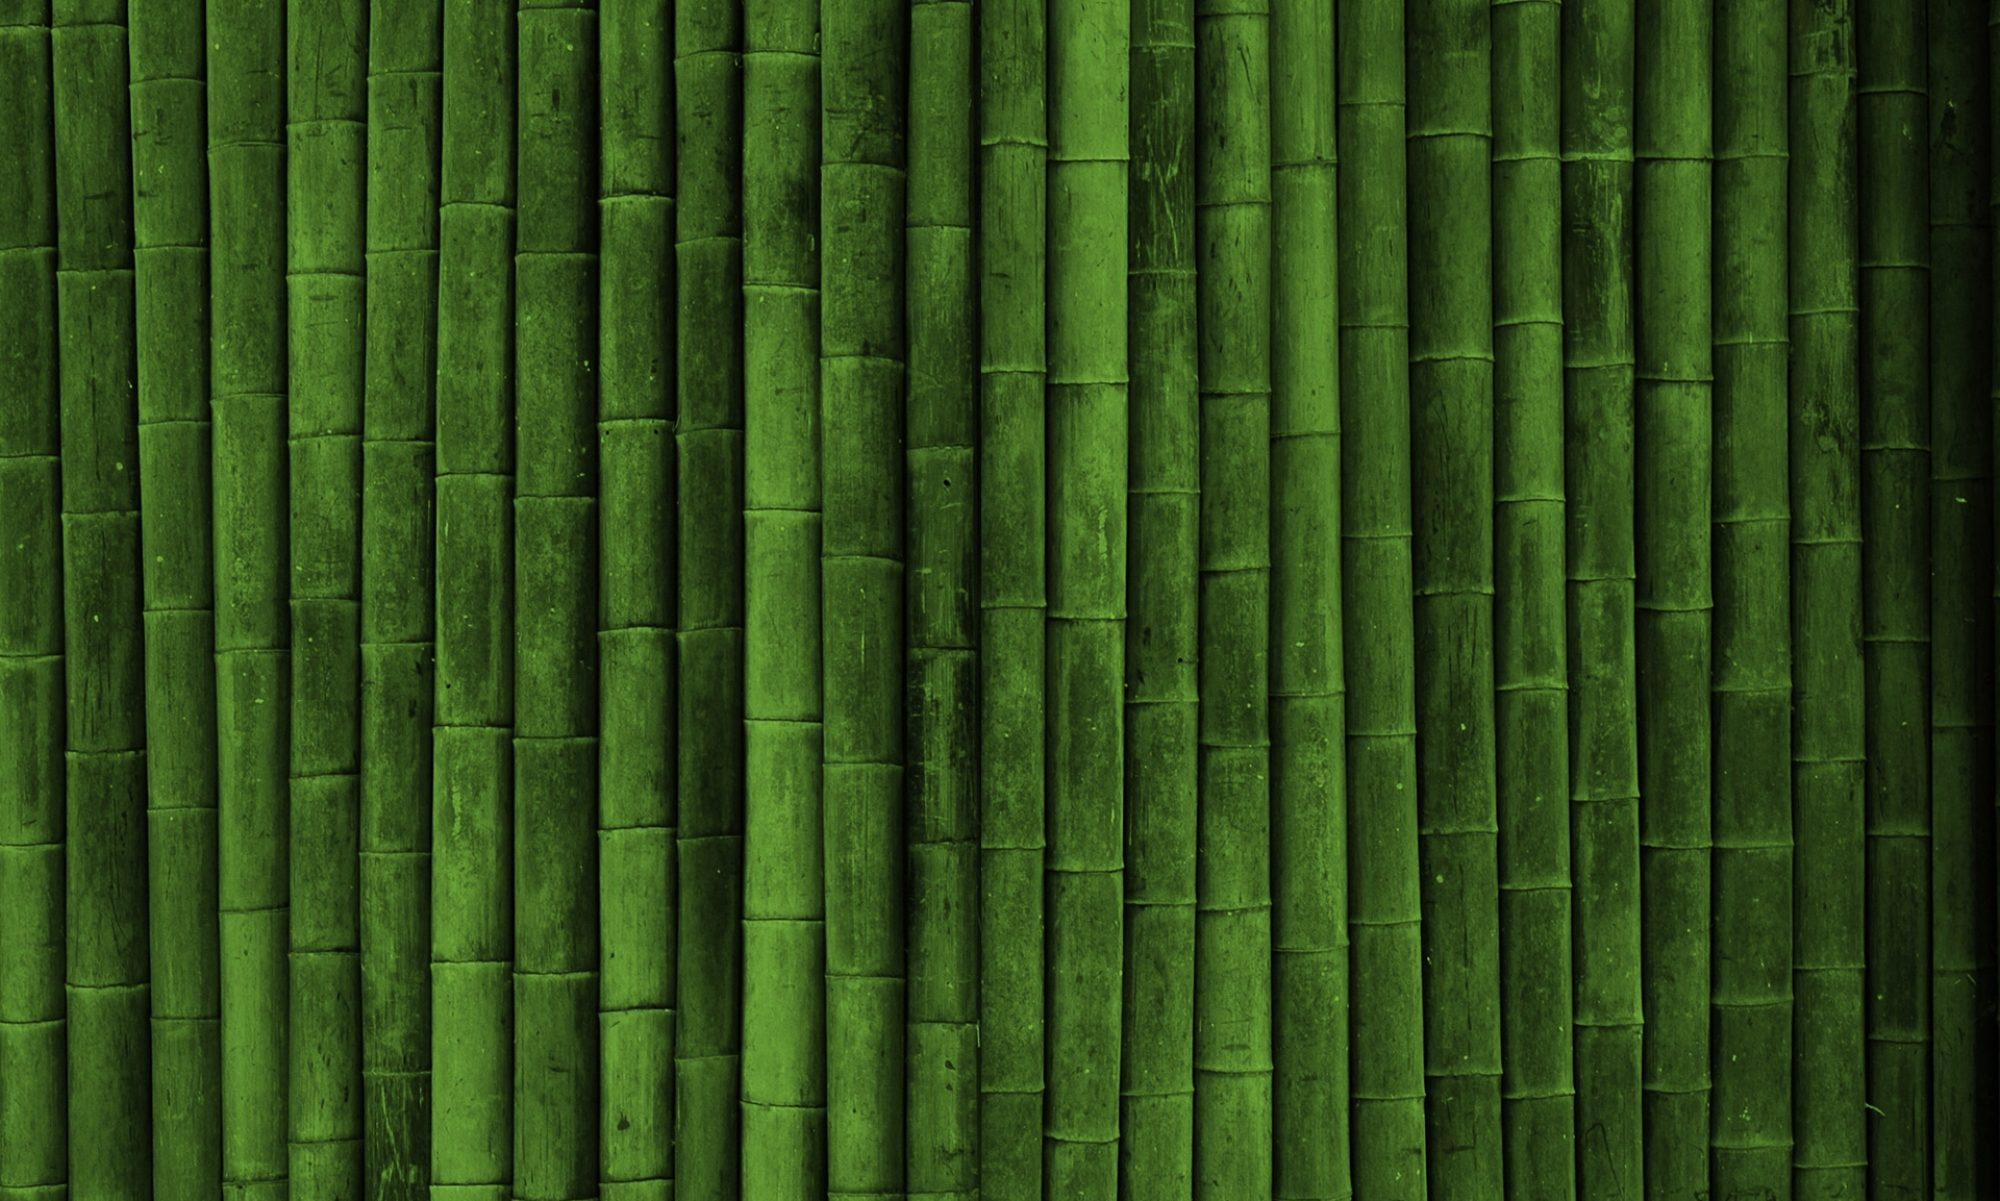 BambooHUB